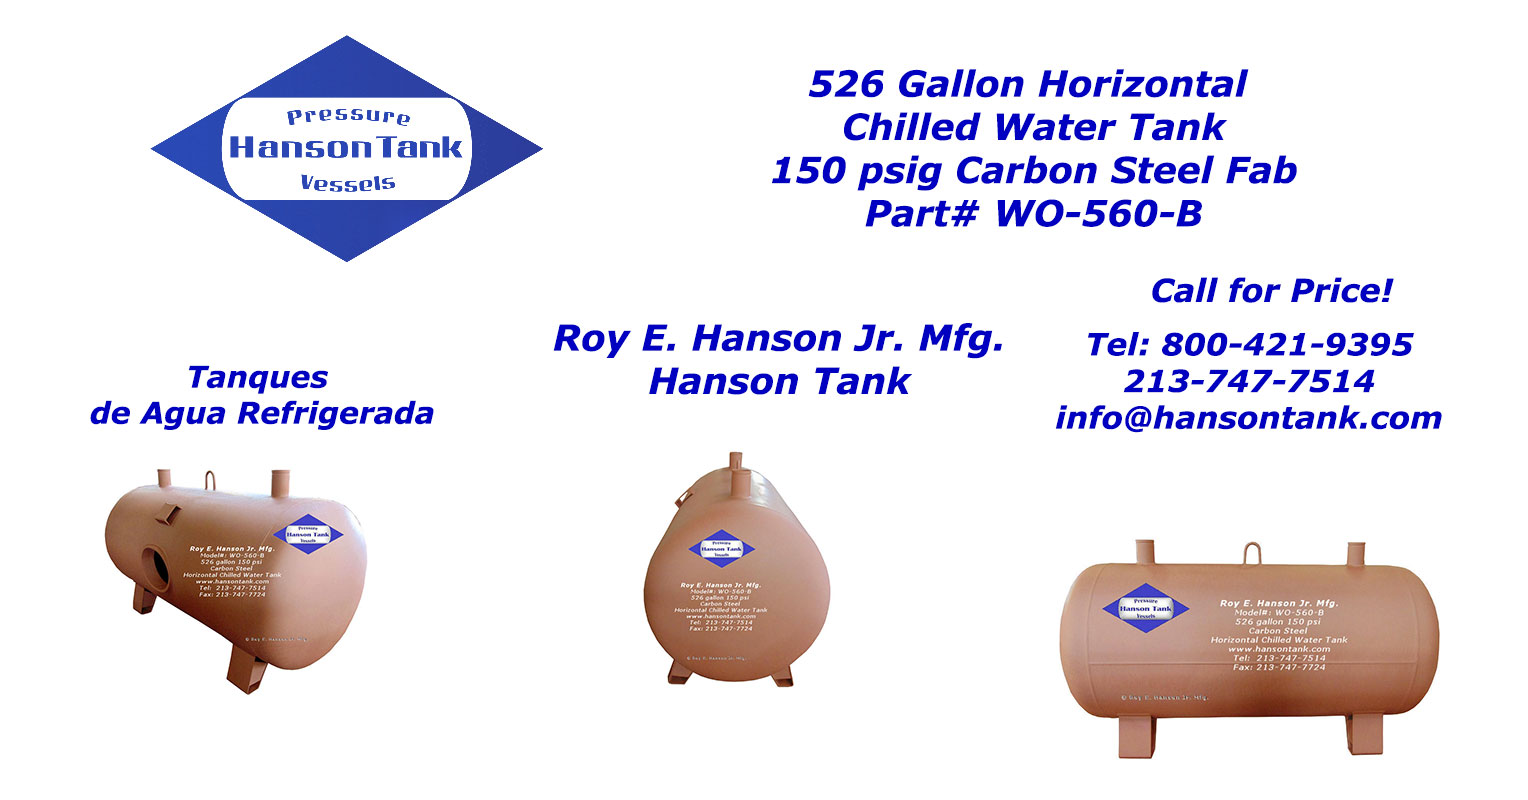 WO-560-B 150 psig horizontal chilled water tank